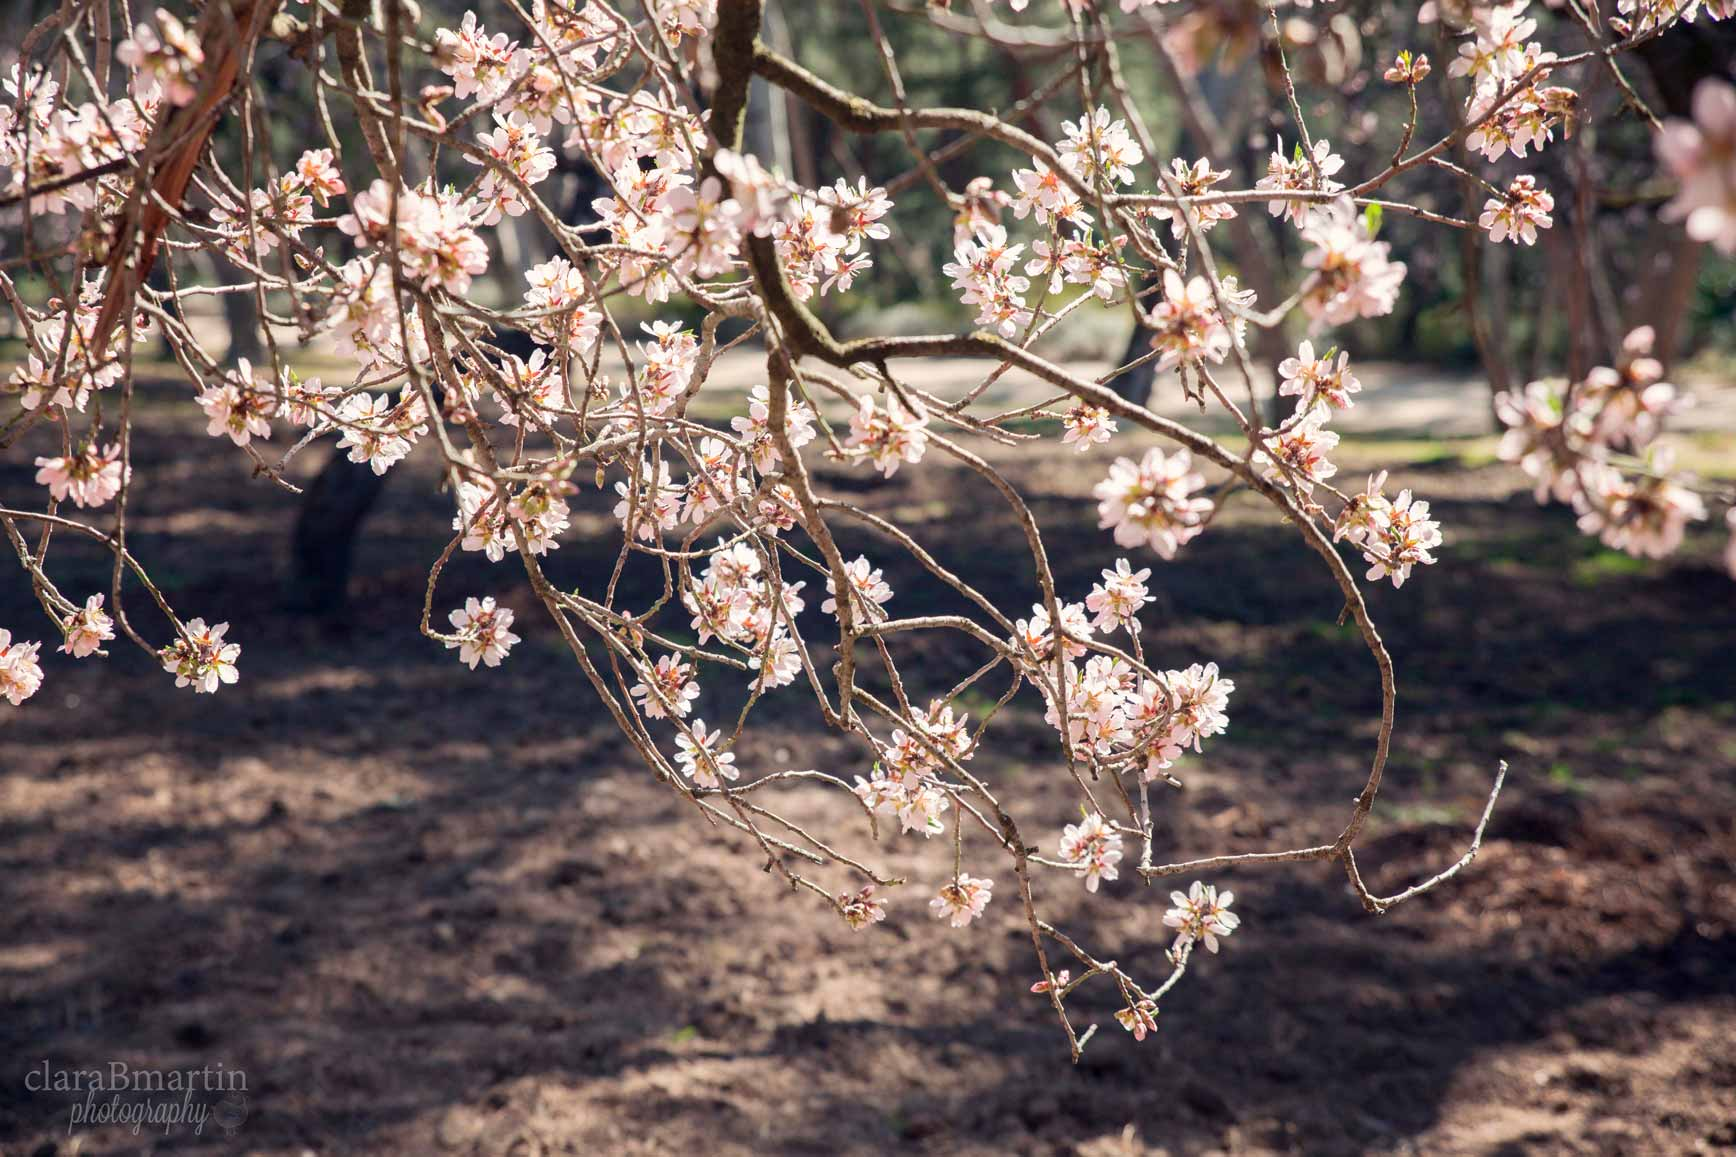 Primavera_claraBmartin11